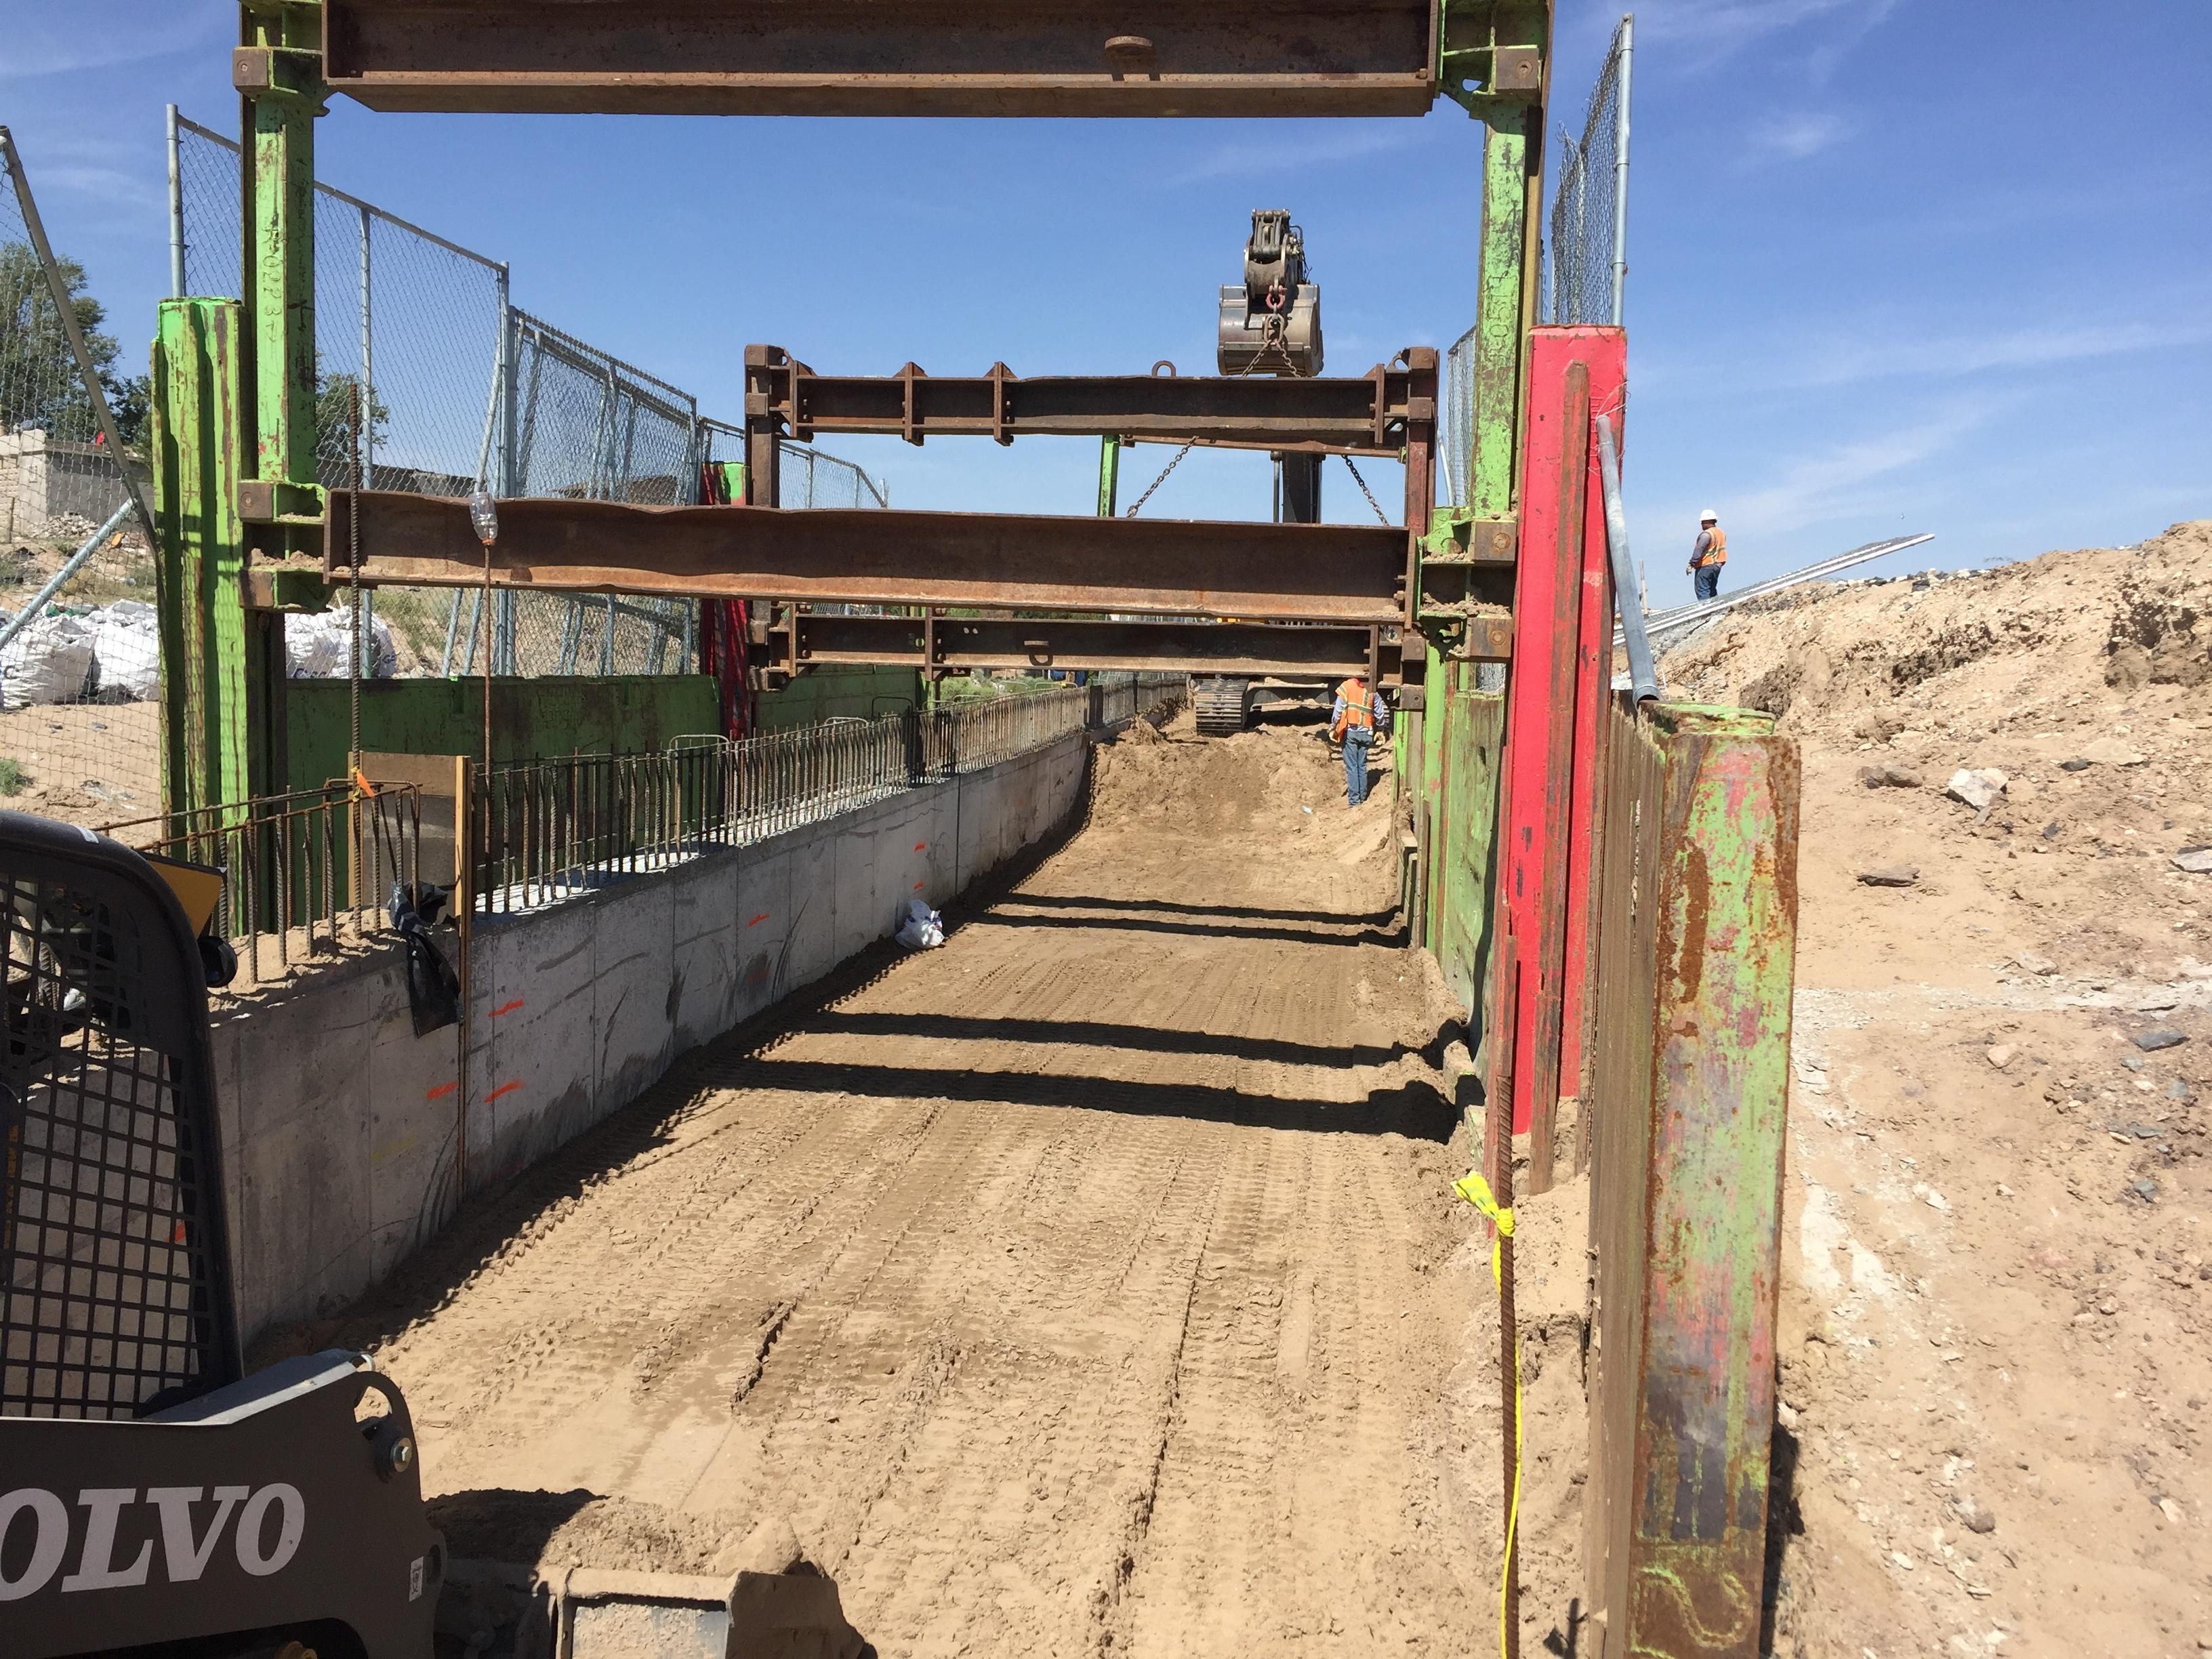 Anapra Border Fence Project